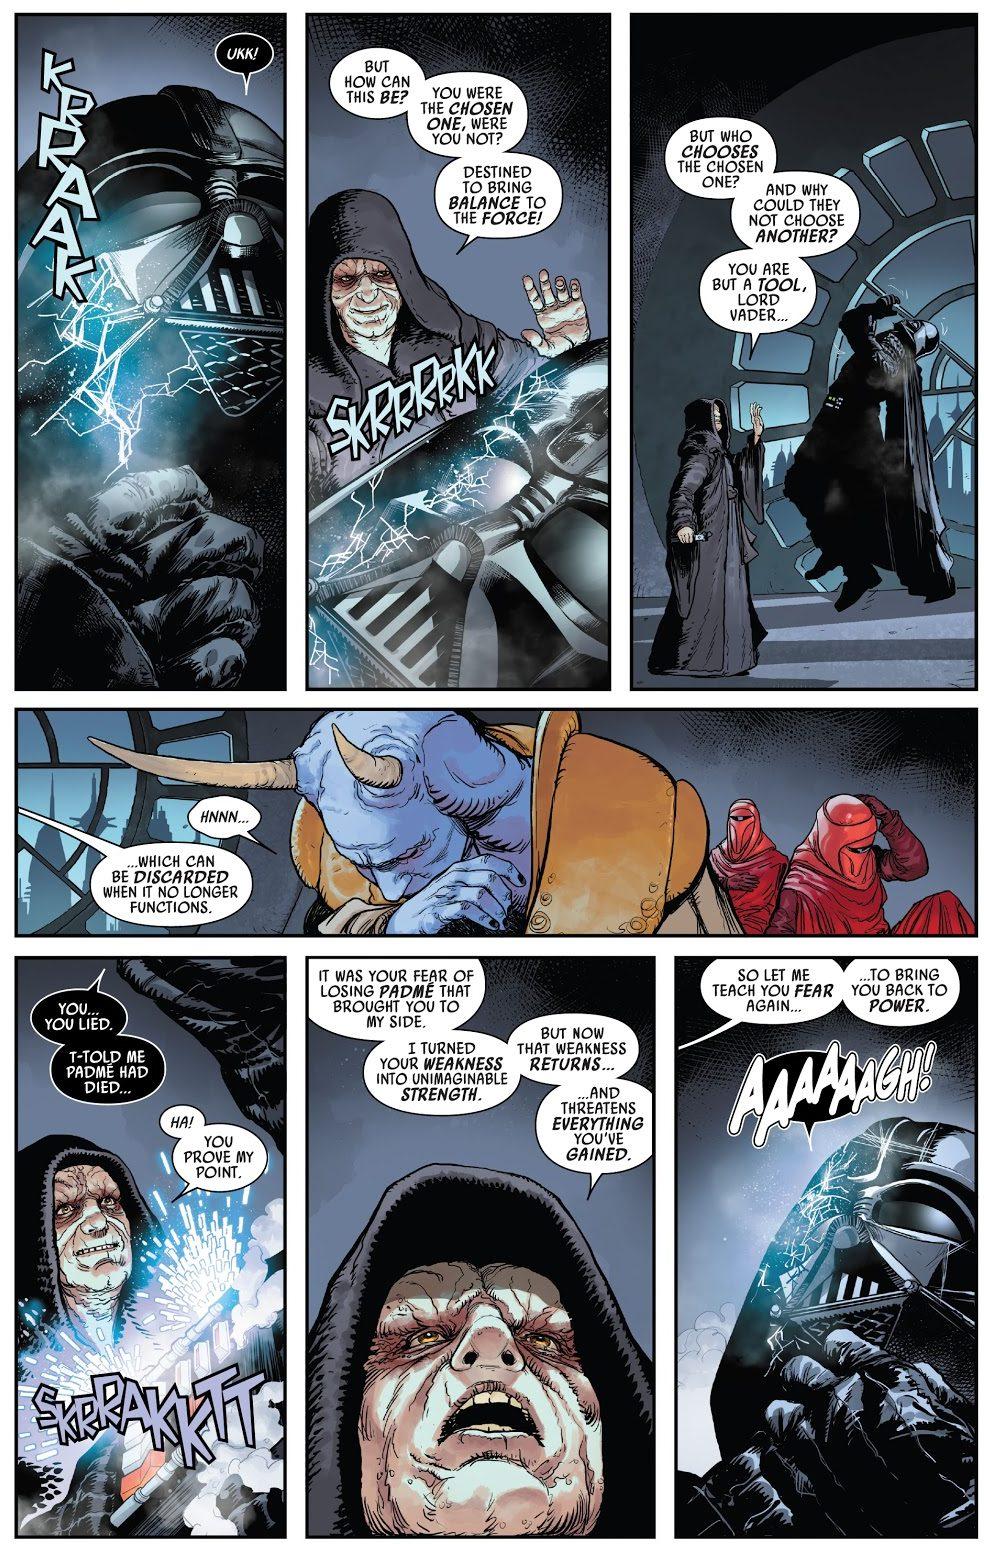 Emperor Palpatine Leaves Darth Vader In Mustafar